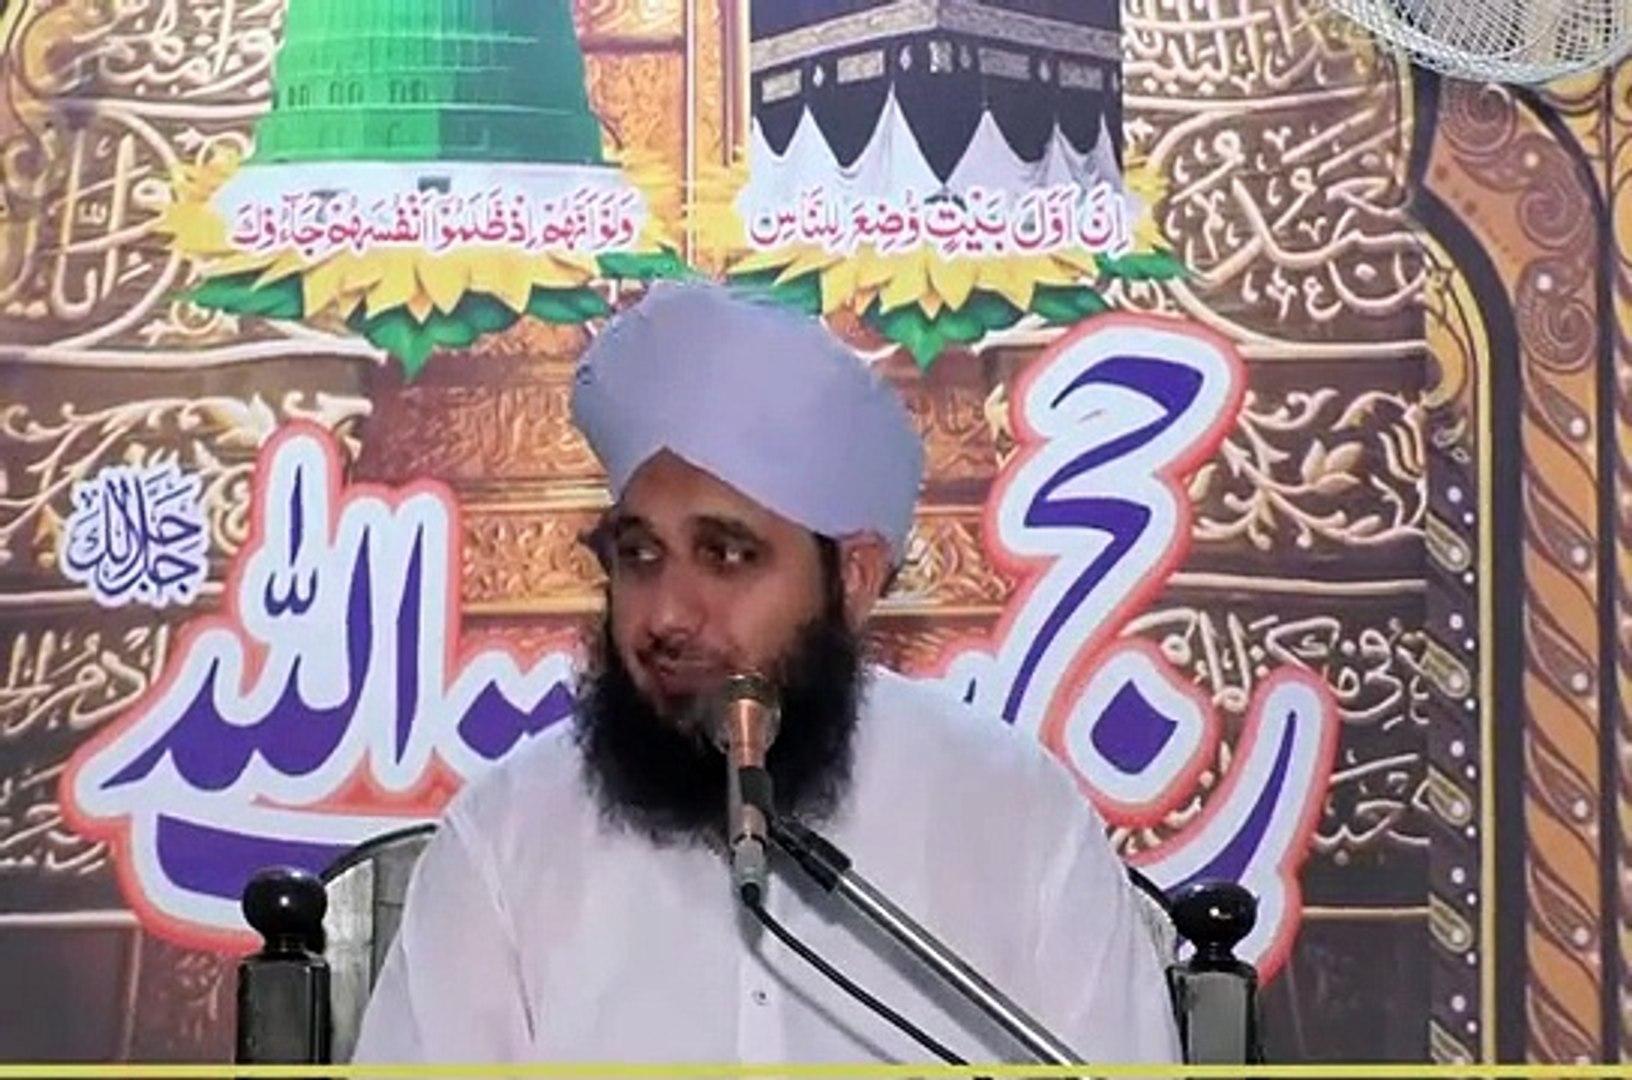 Hajj or Ahraam Bandhany ka Tariqa By Muhammad Ajmal Raza Qadri